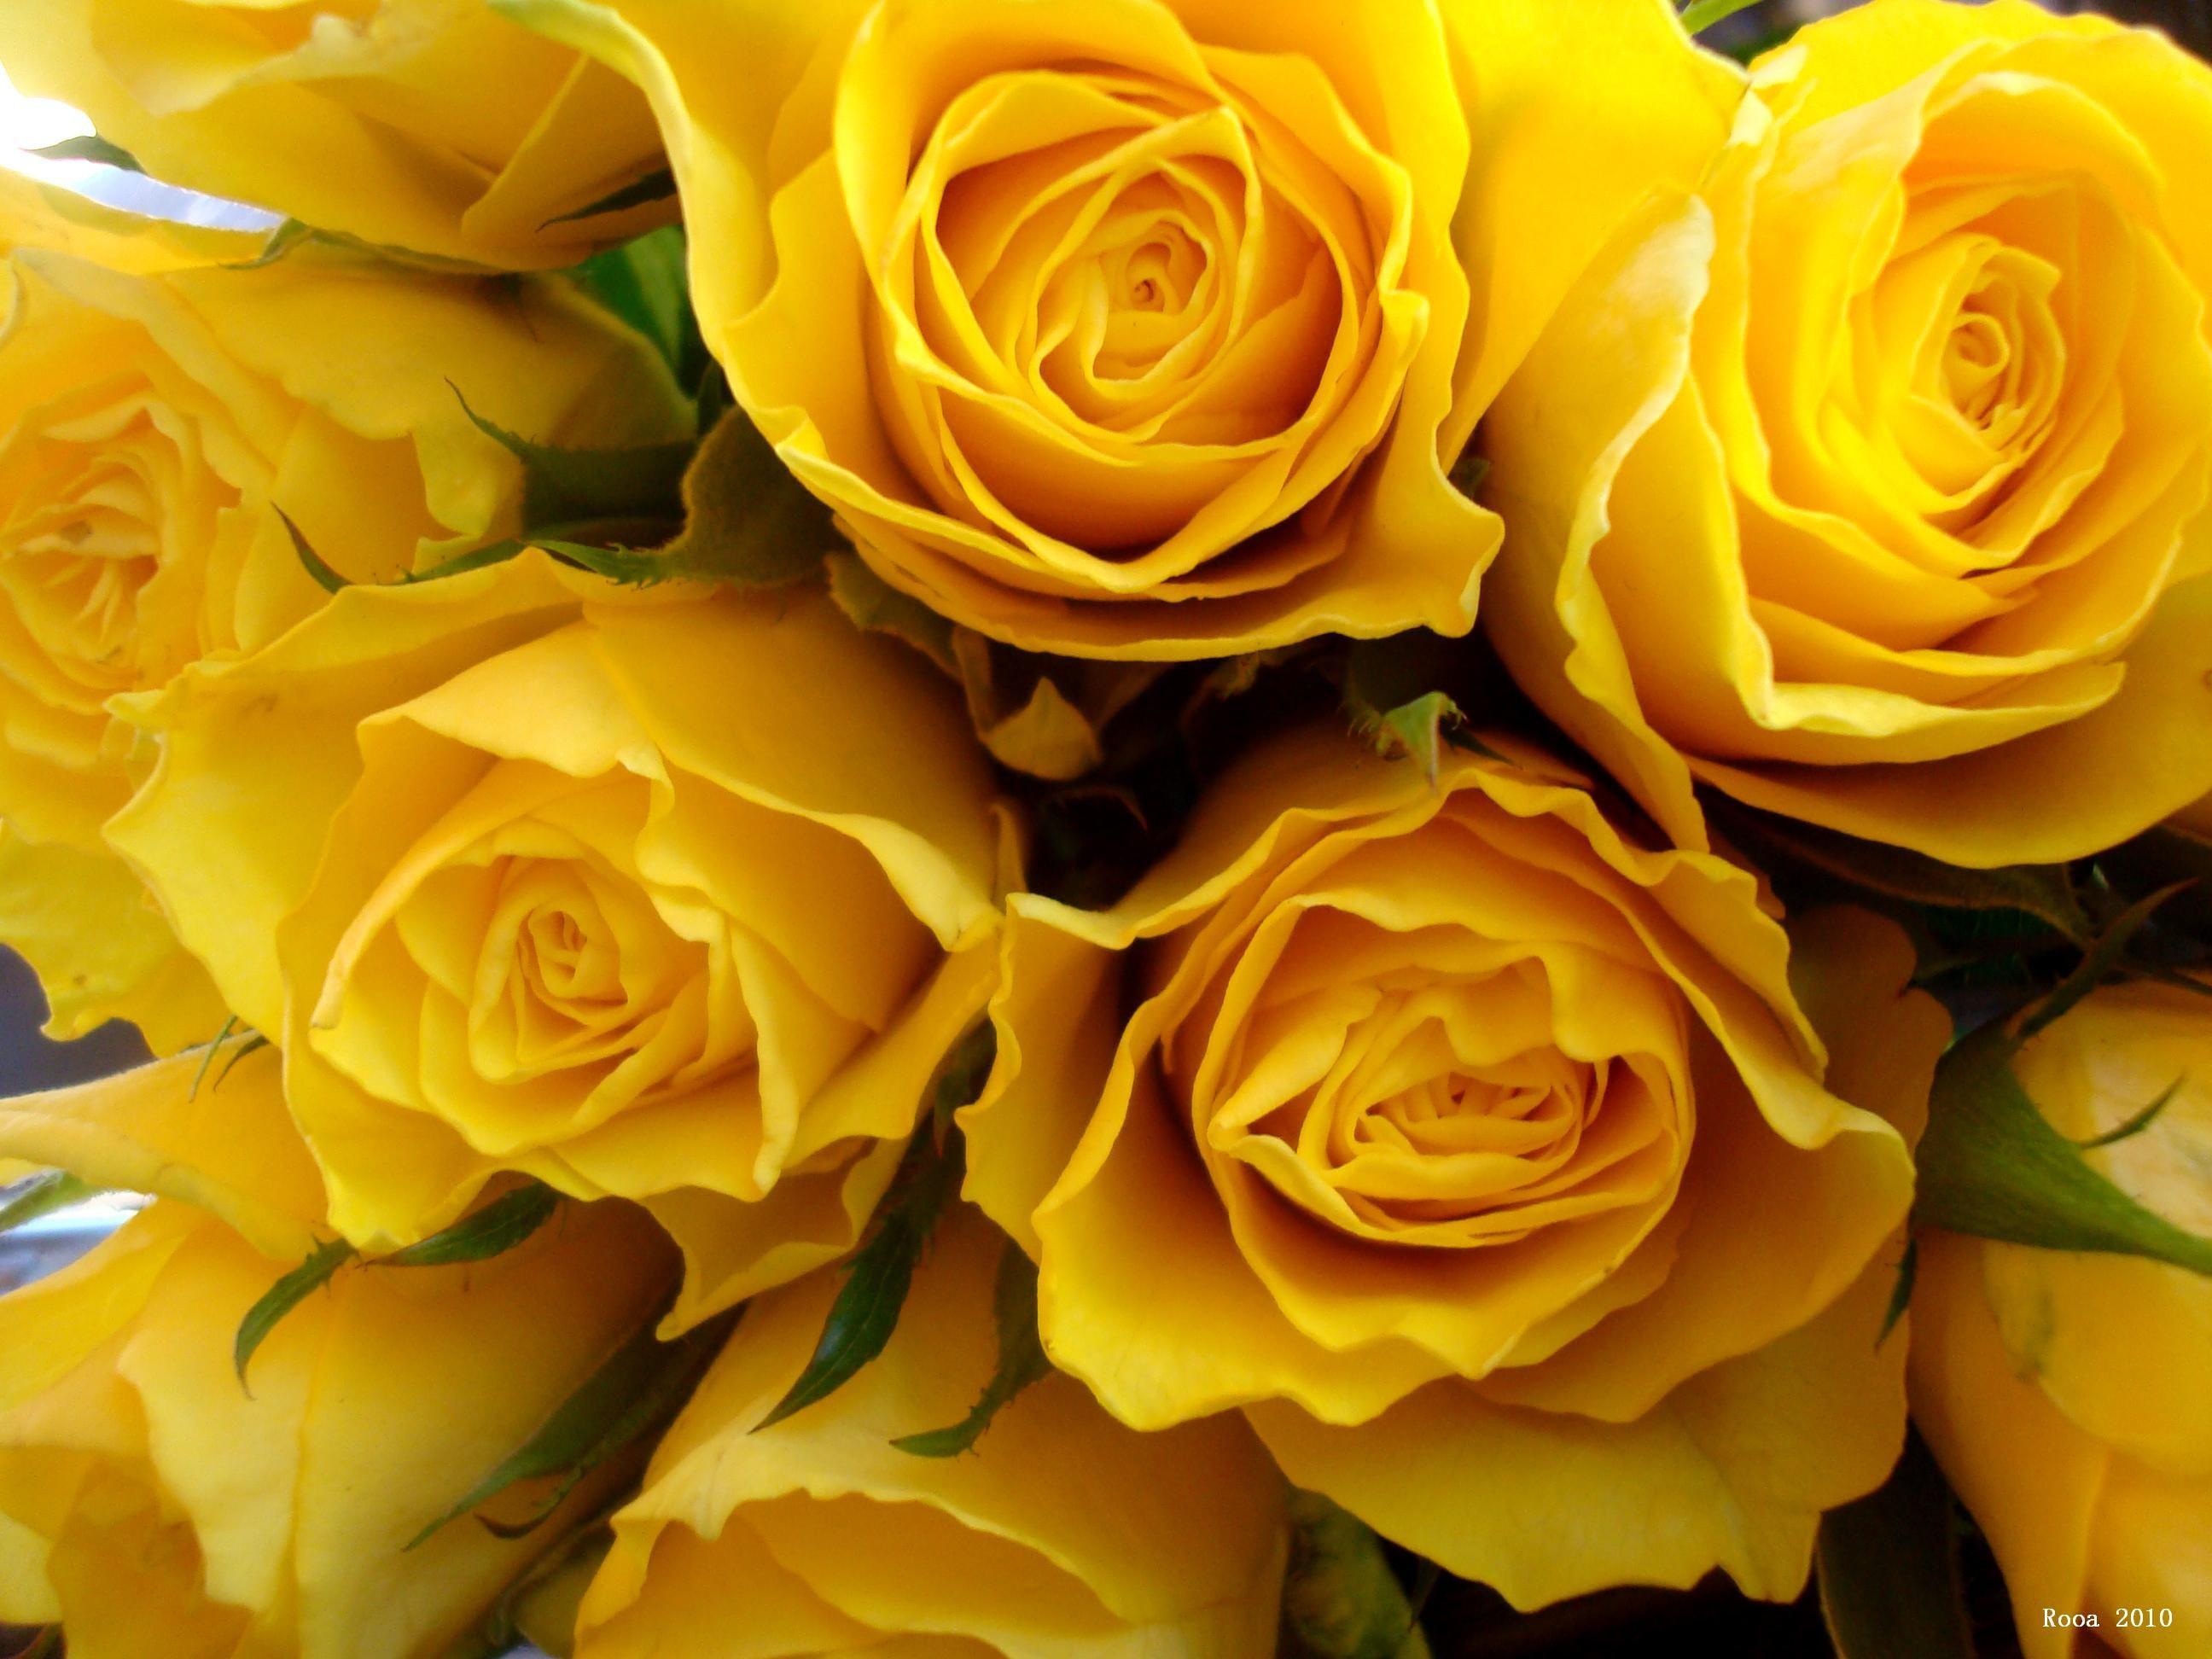 Yellow Aesthetic Mac Wallpapers - Top Free Yellow ...